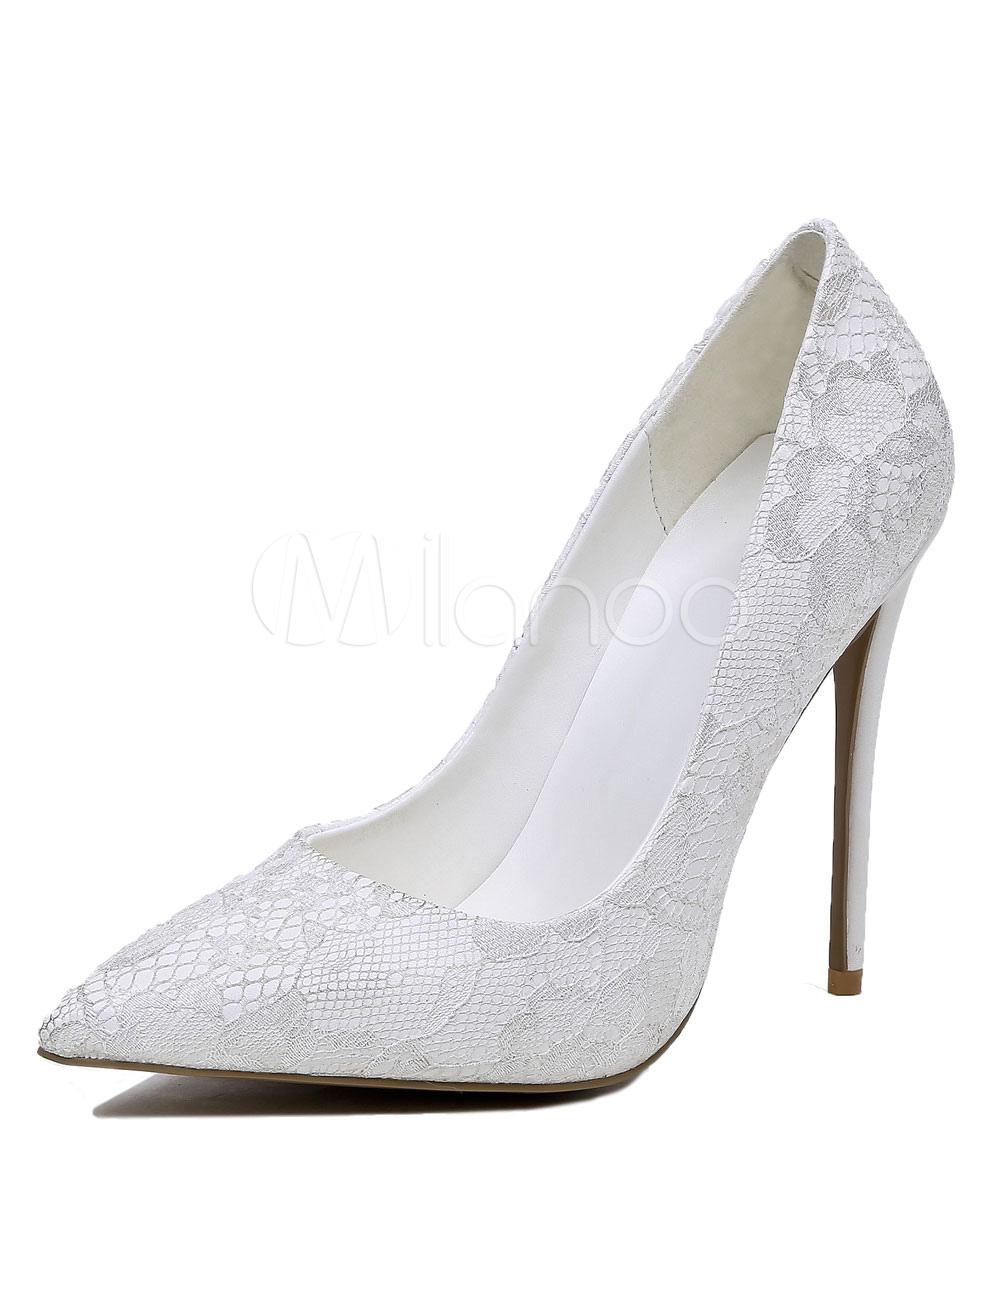 Scarpe Sposa Pizzo Bianche.Scarpe Sposa Eleganti Bianche A Punta Tacco A Fino 12cm Pizzo